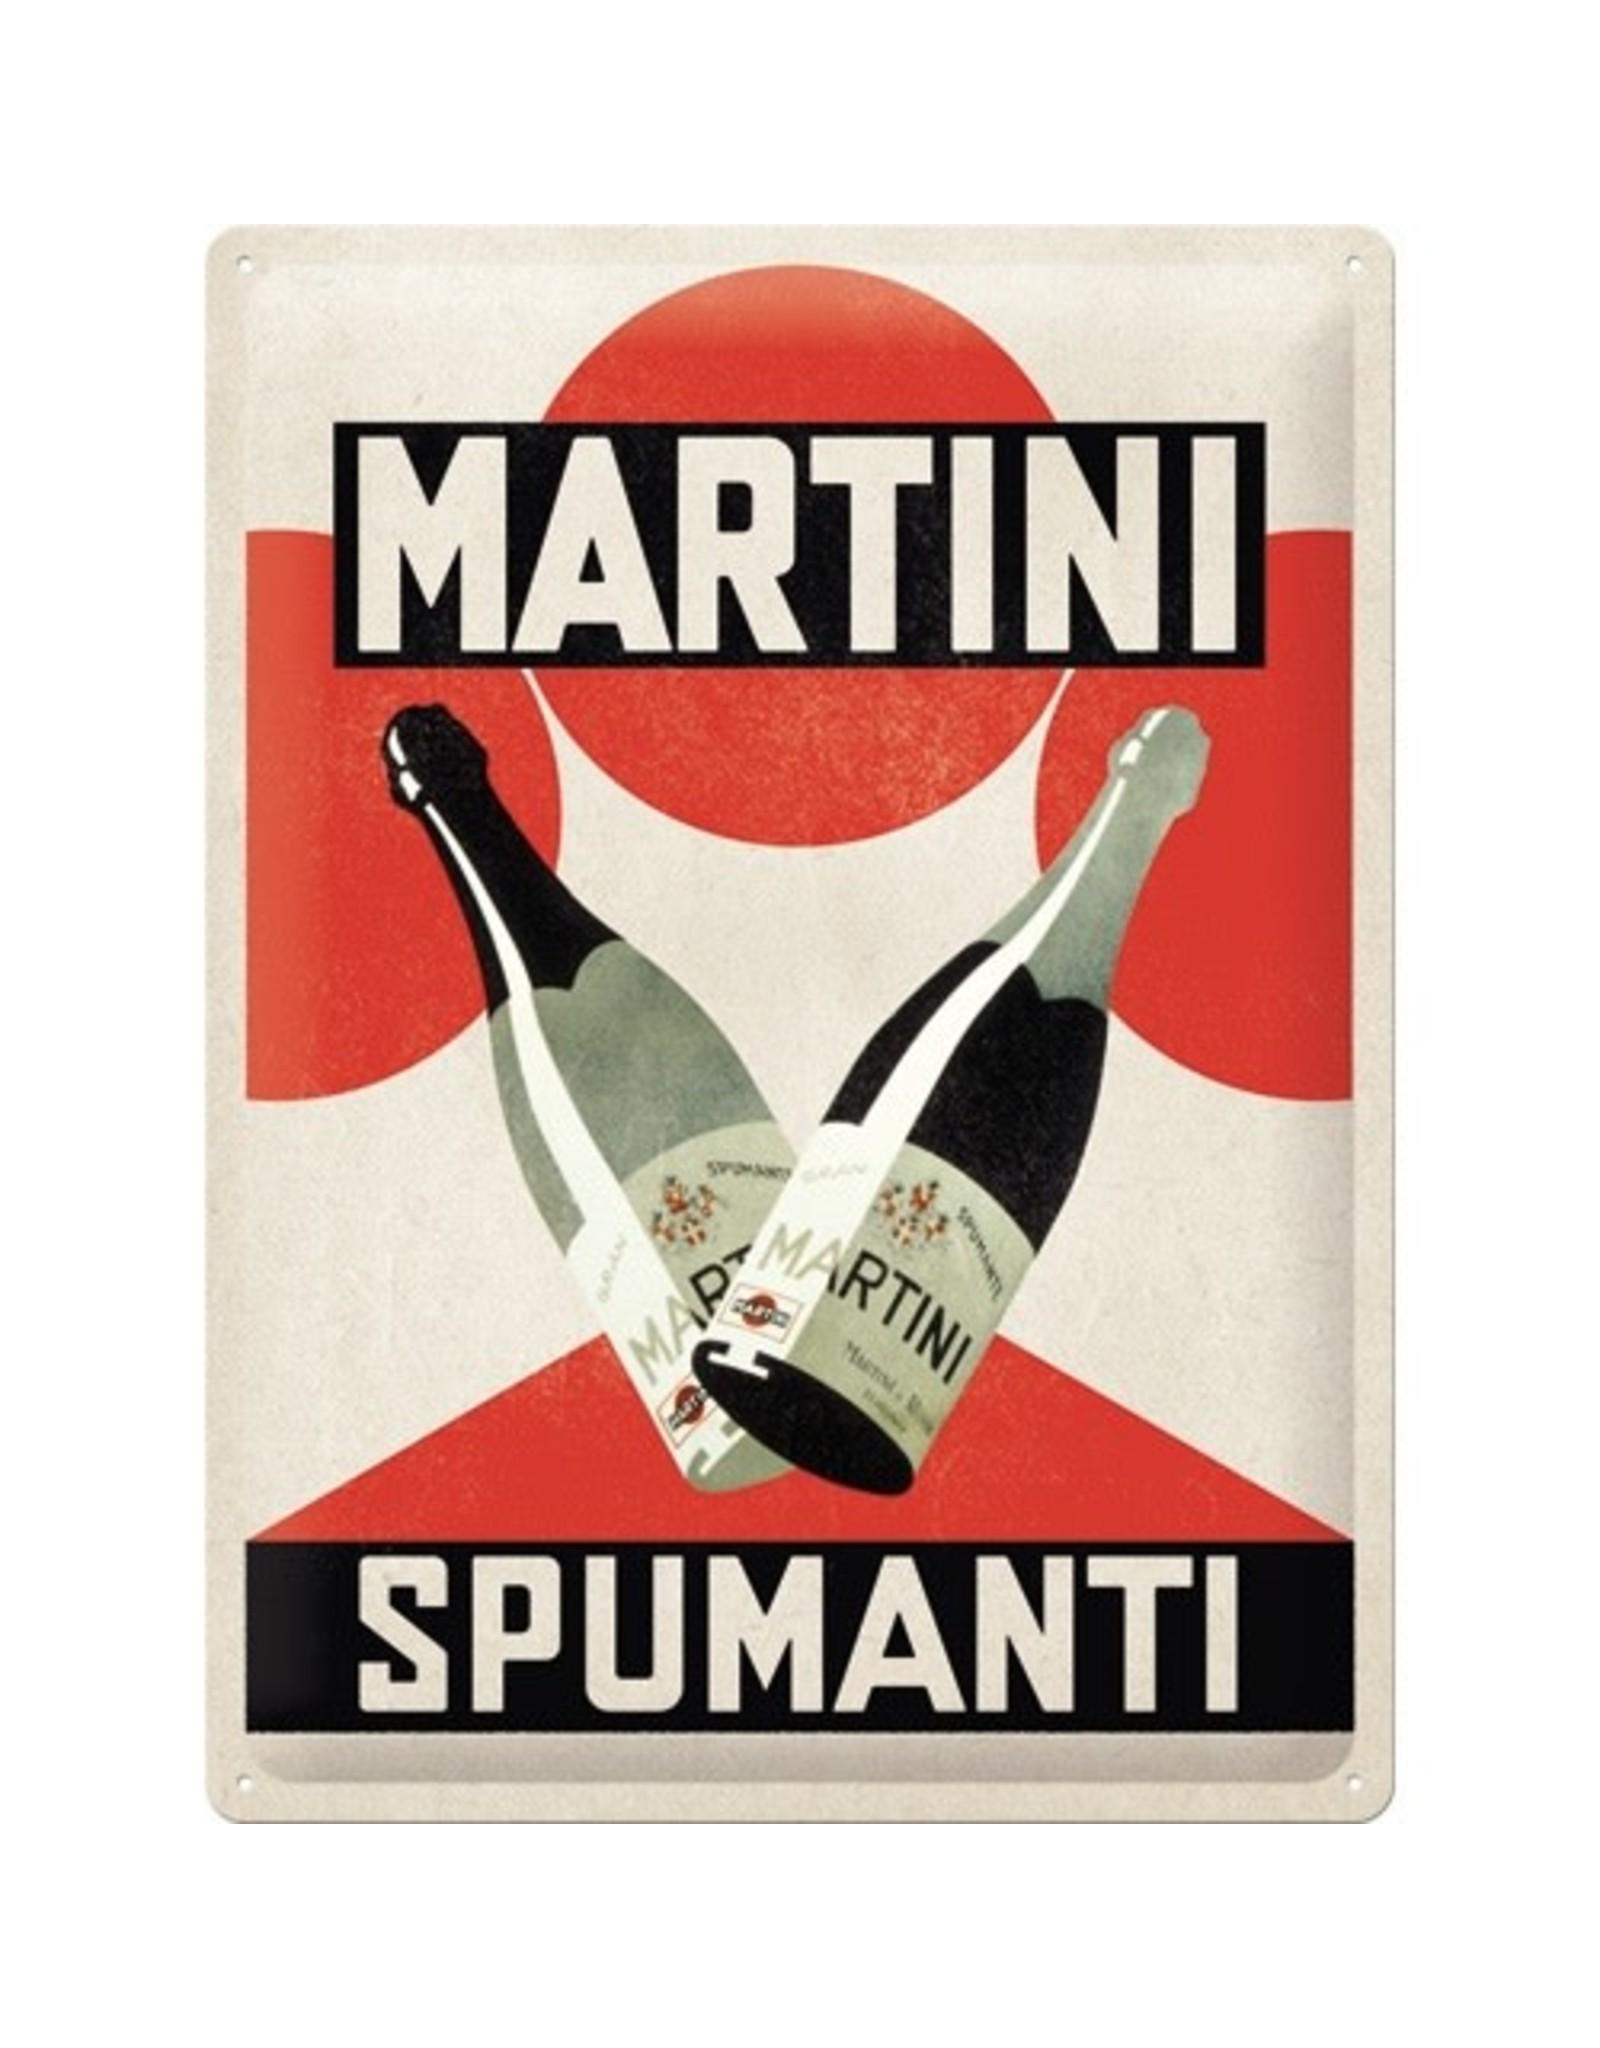 Nostalgic Art metal sign - 30x40 - martini spumanti